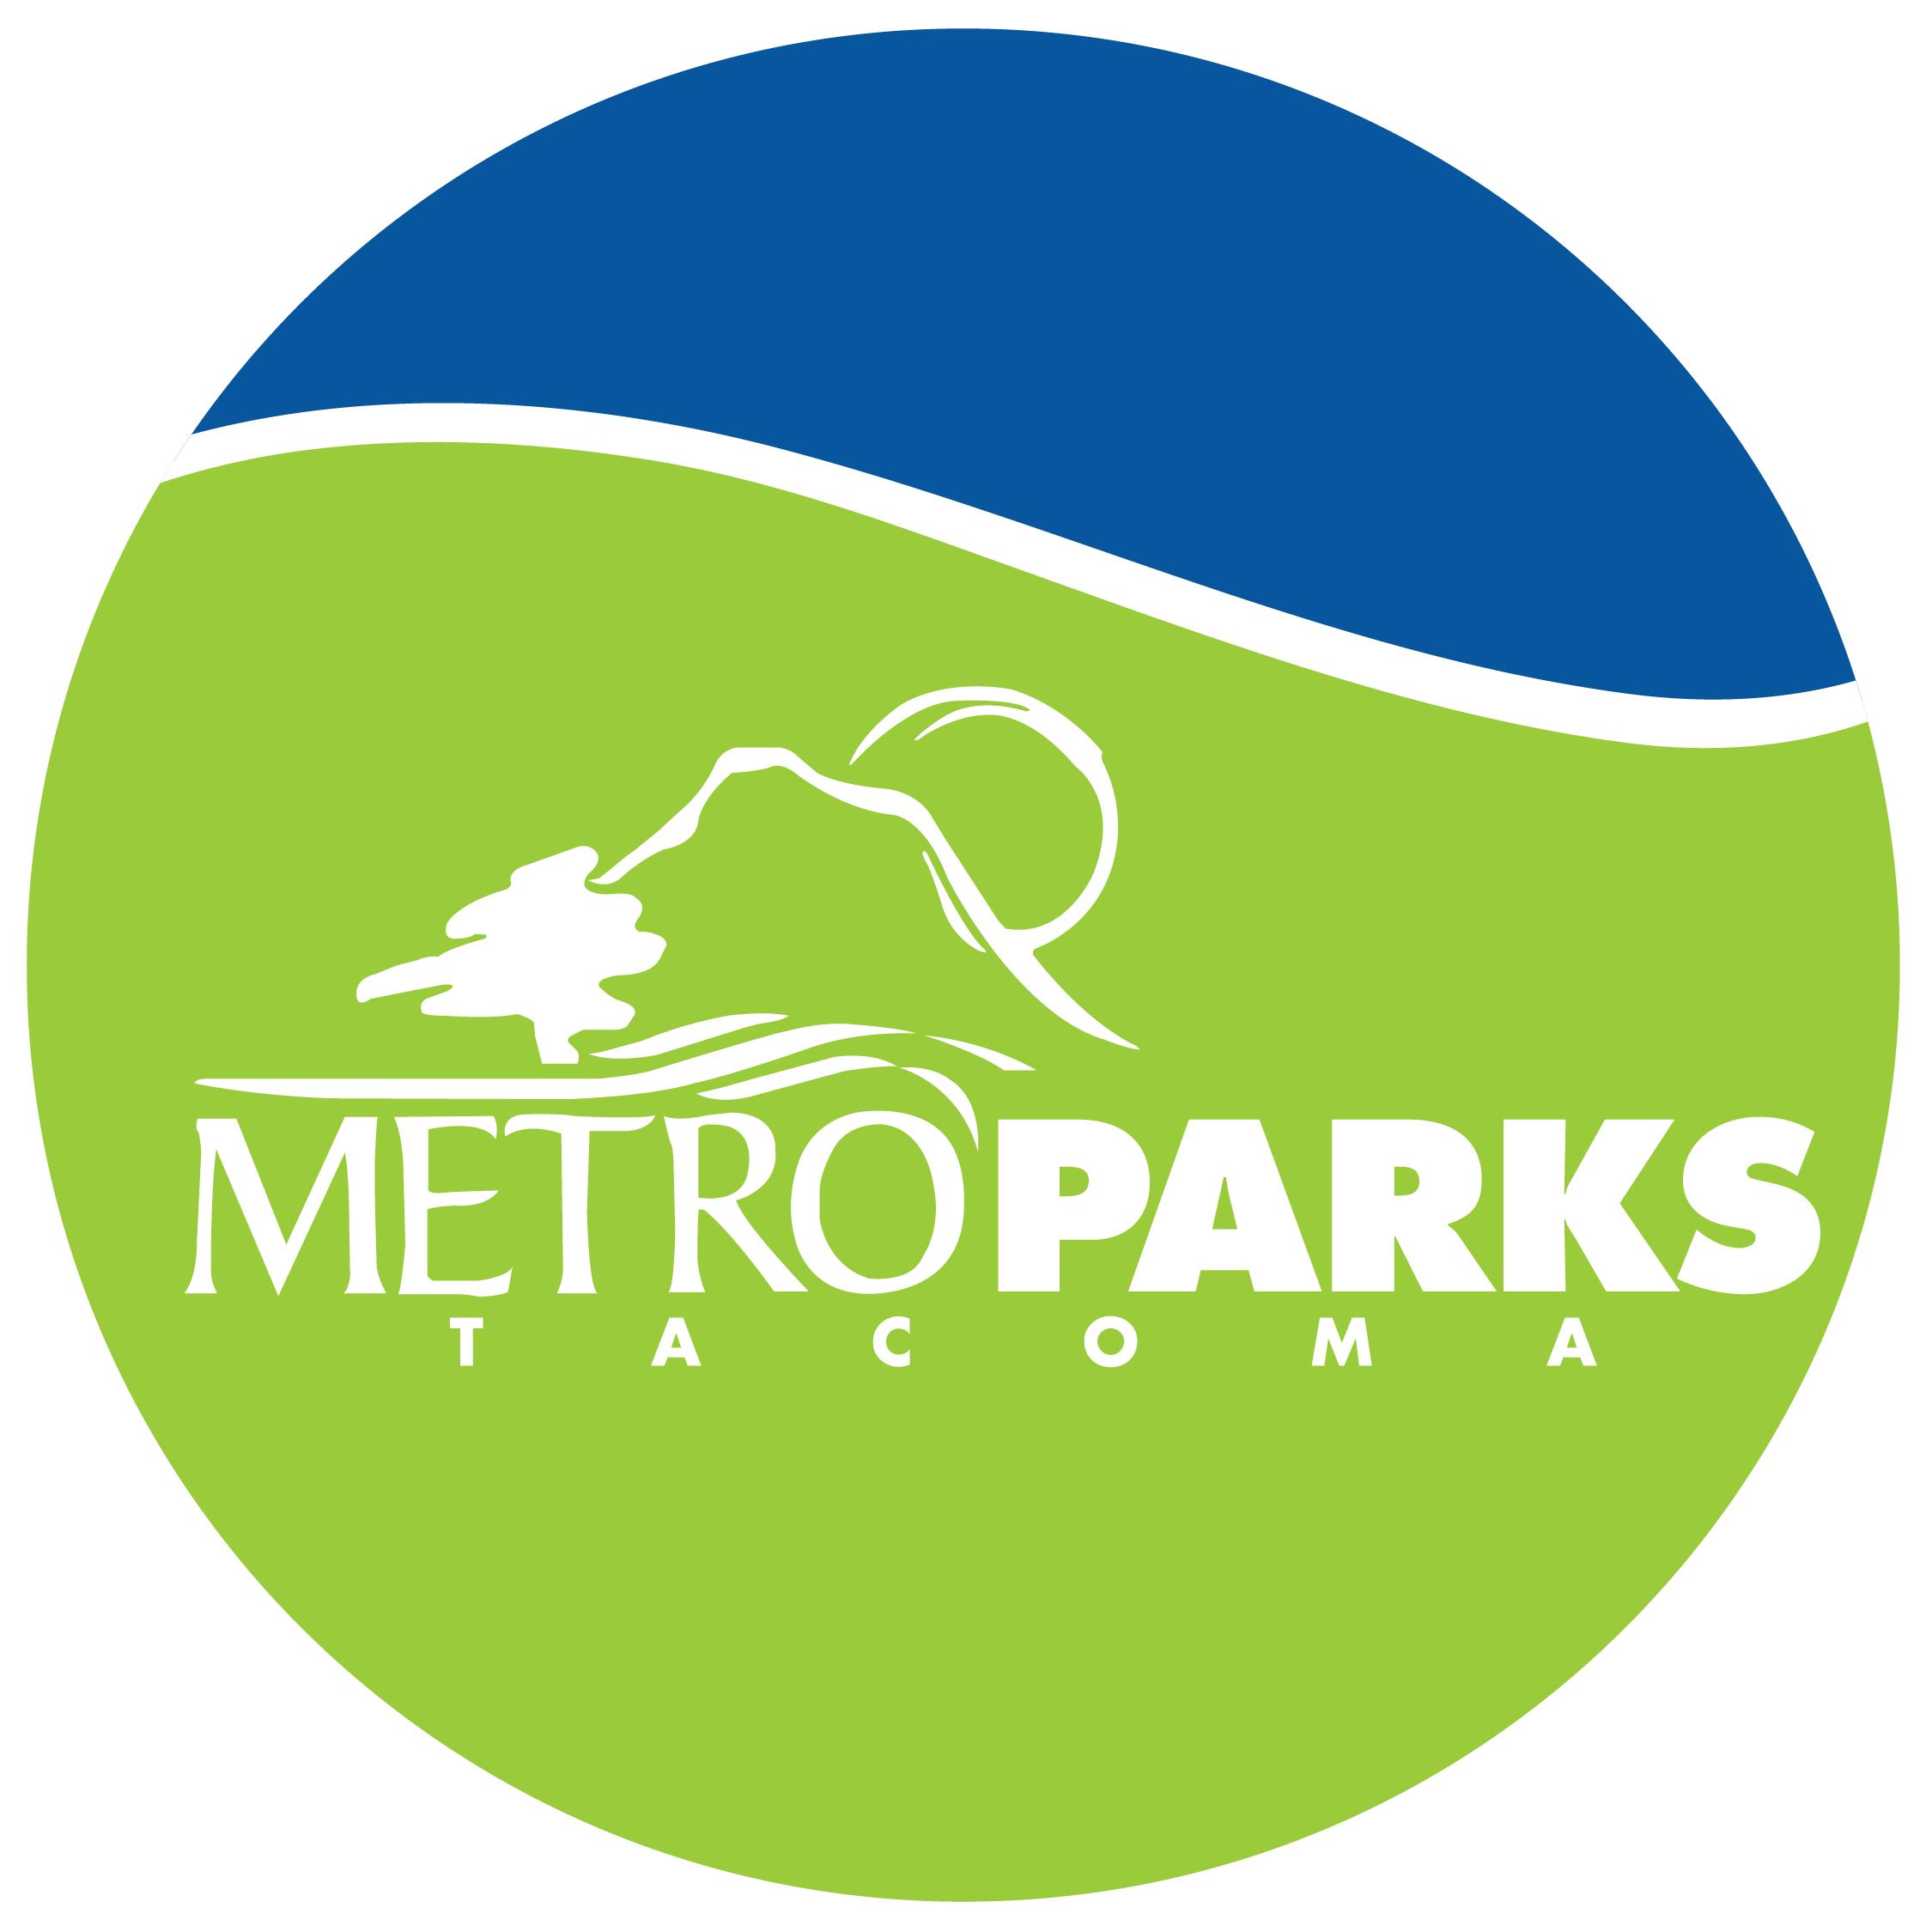 Metro Parks Tacoma Job and Internship Opportunities | Metro